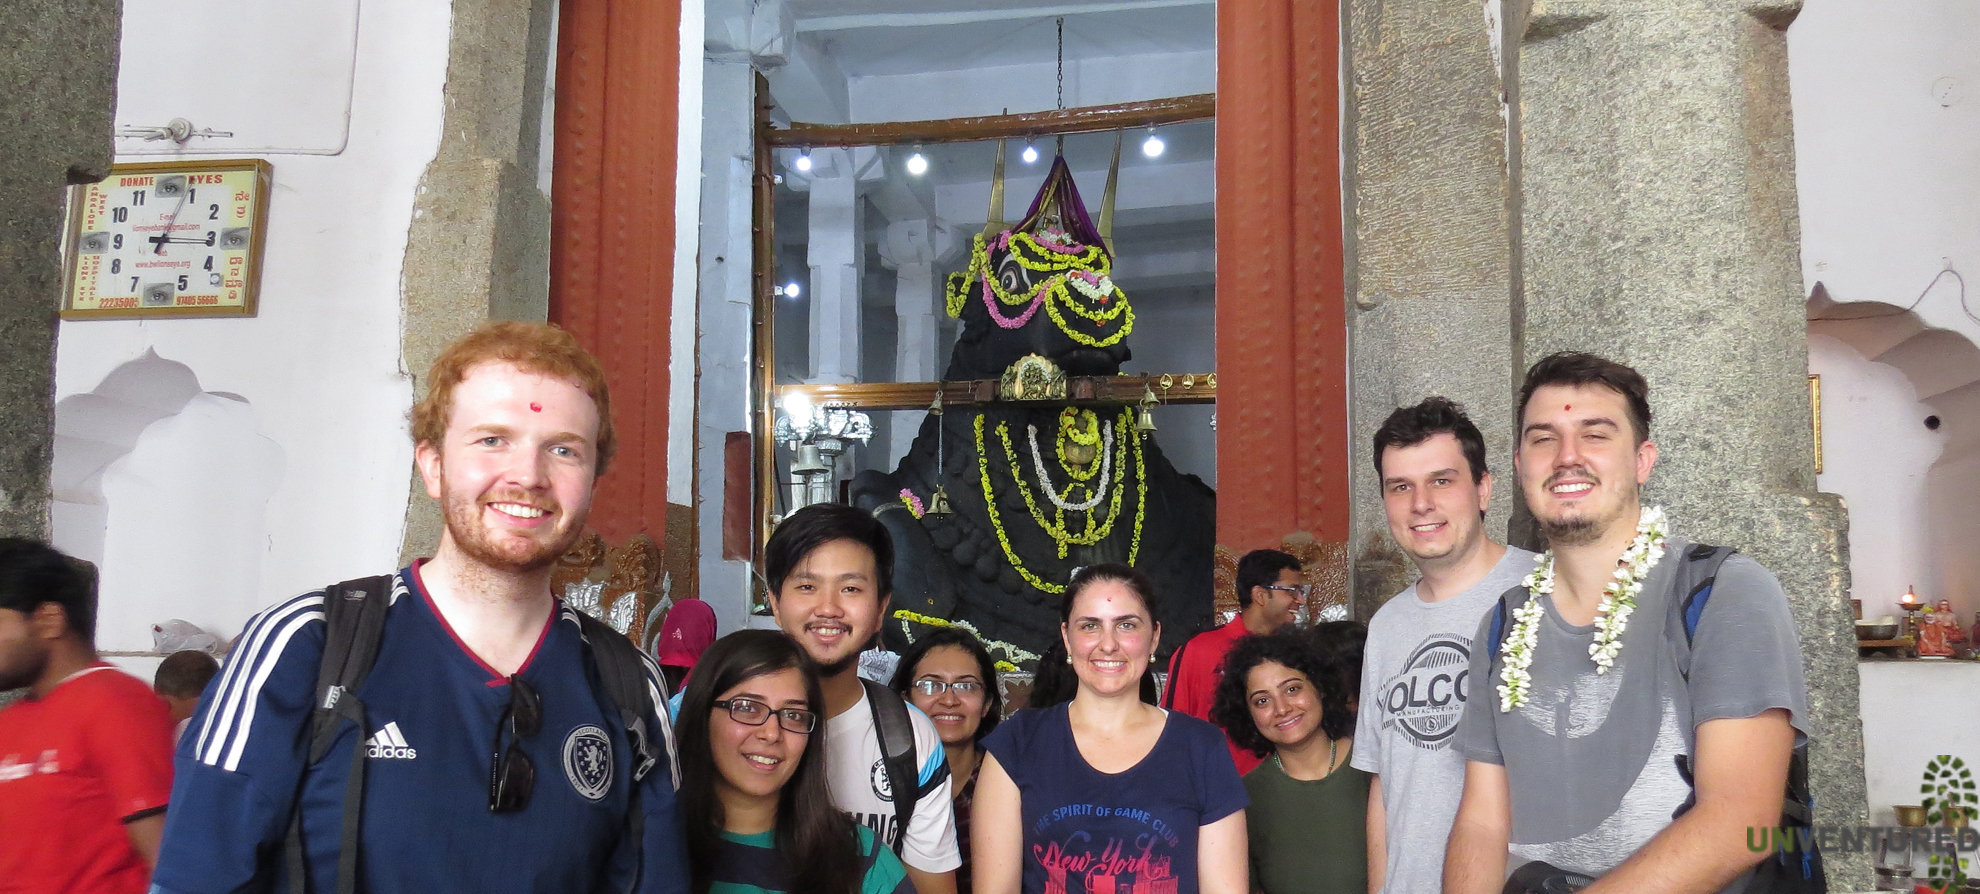 Bengaluru City Tour - Temples and Thindi